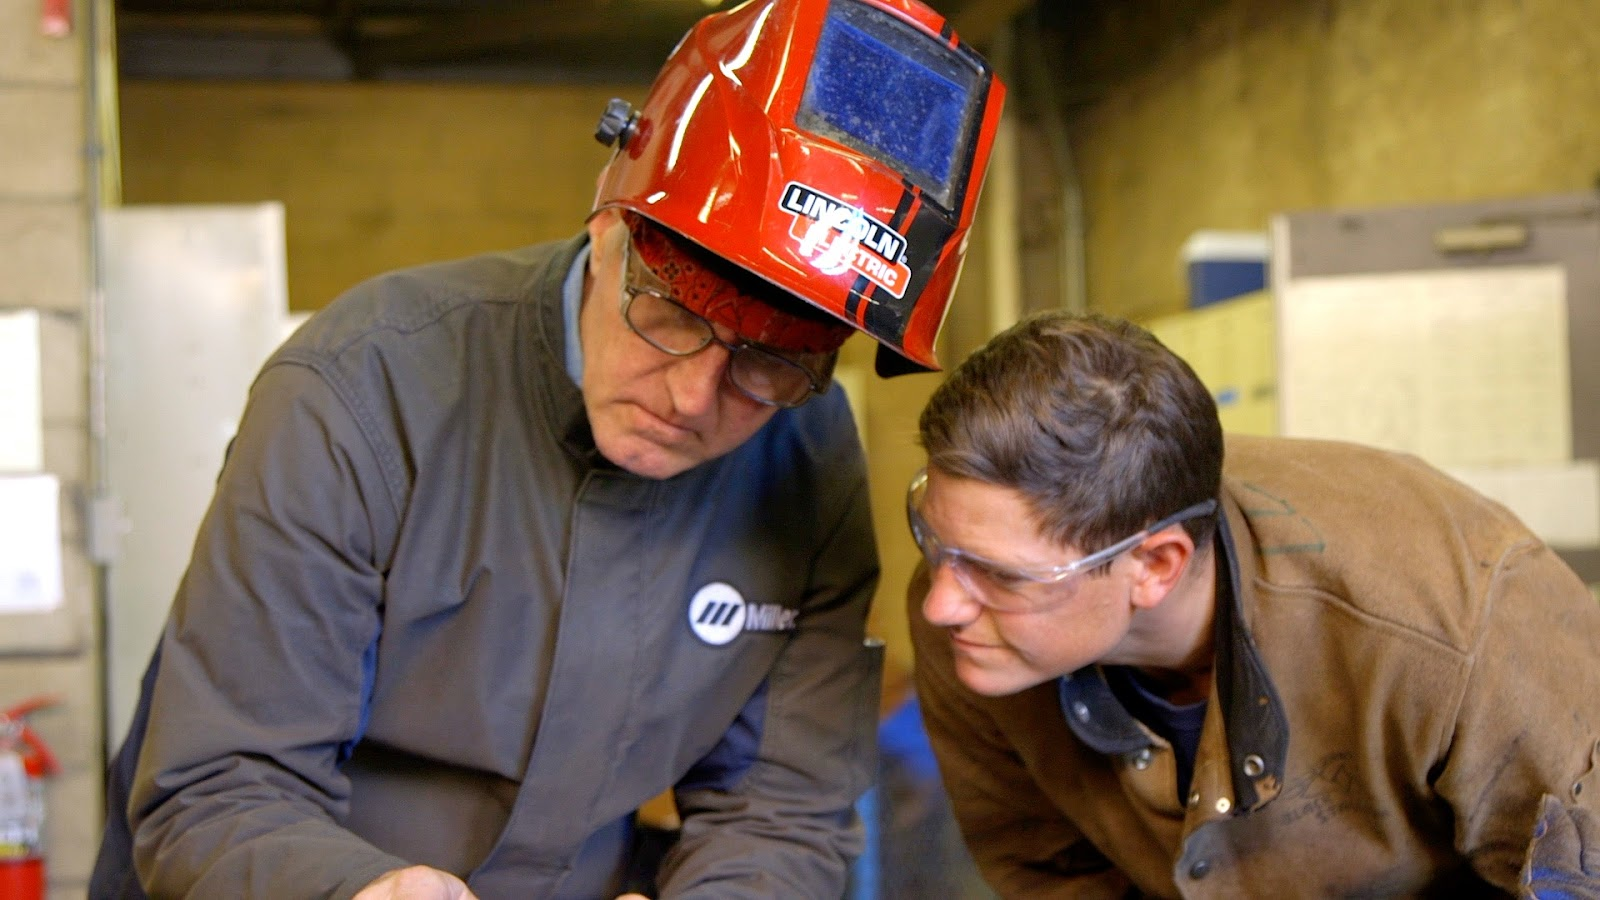 Welding instructor working with welding student